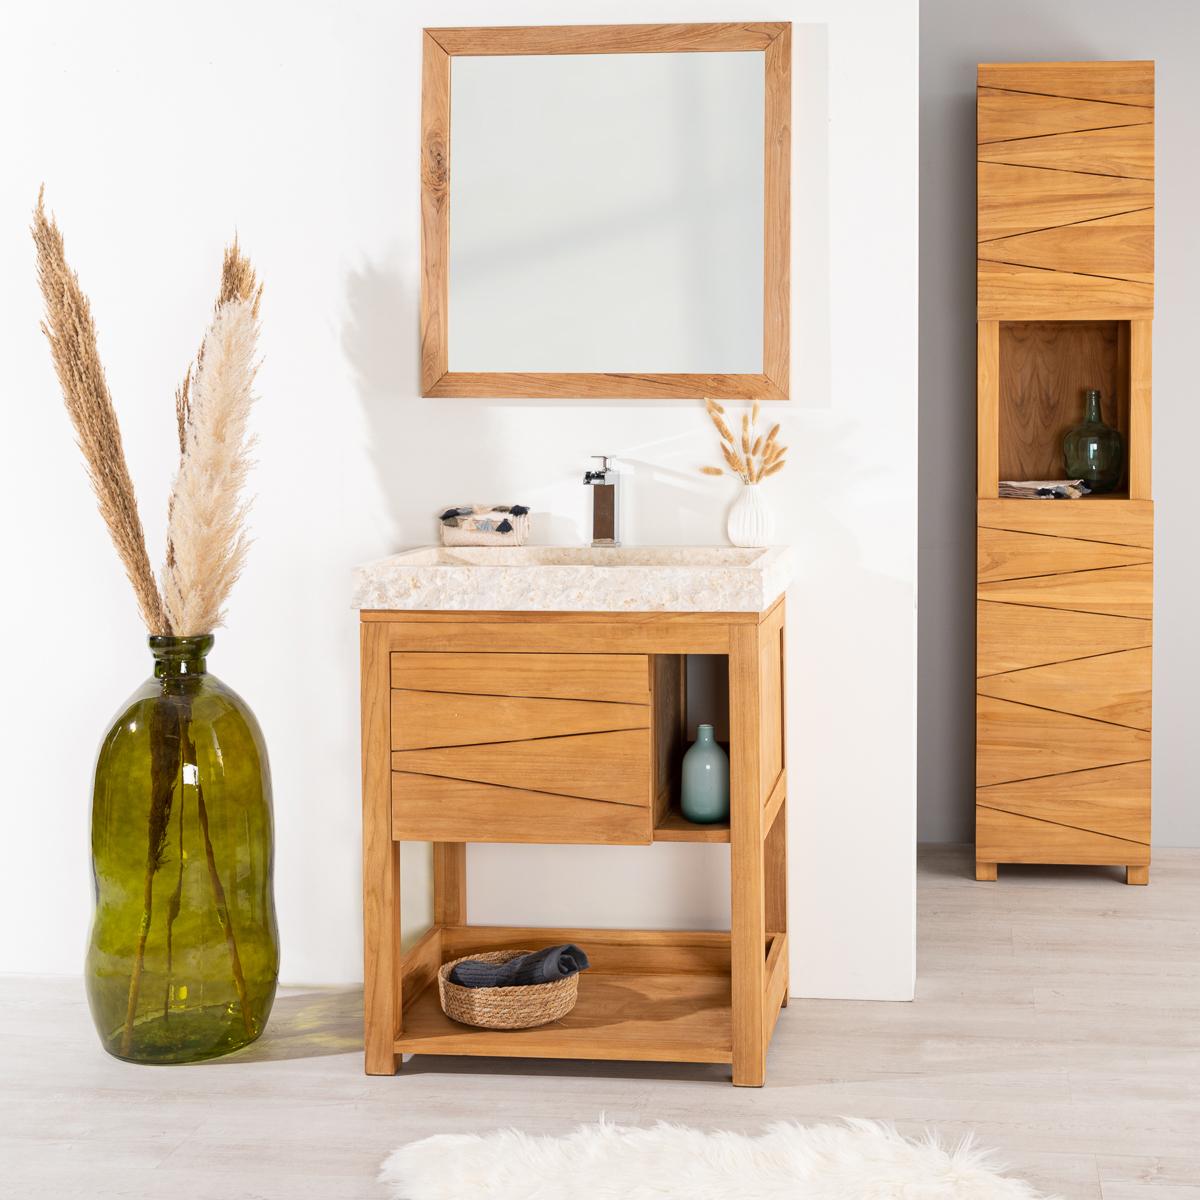 mueble de teca maciza cosy 67 cm lavabo crema